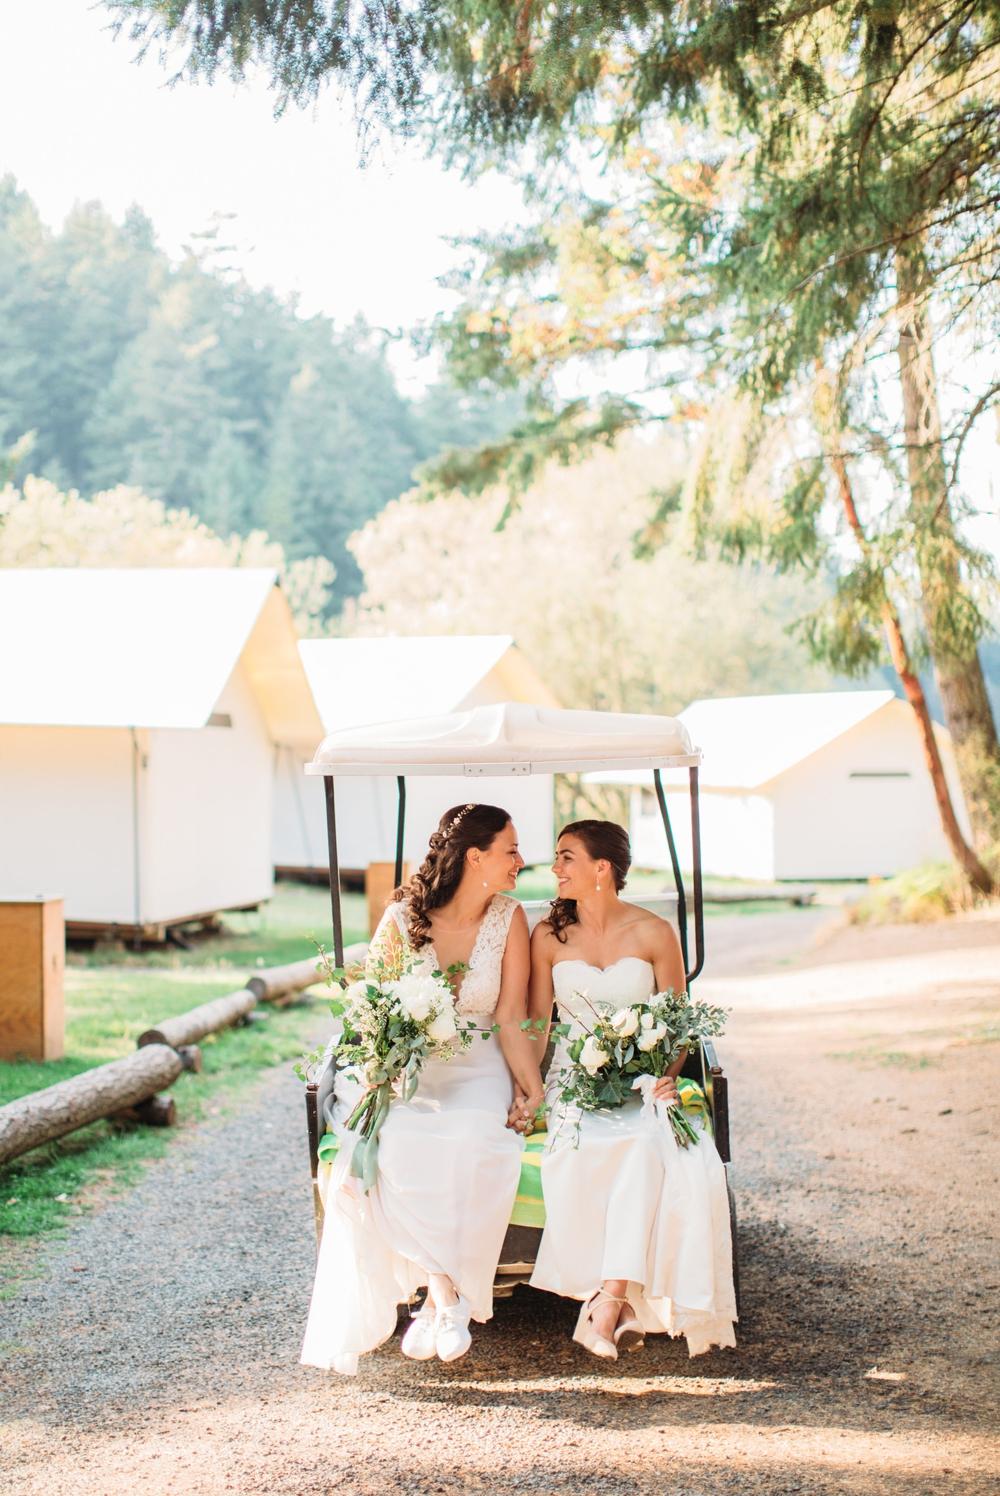 brides-ride-on-golf-cart